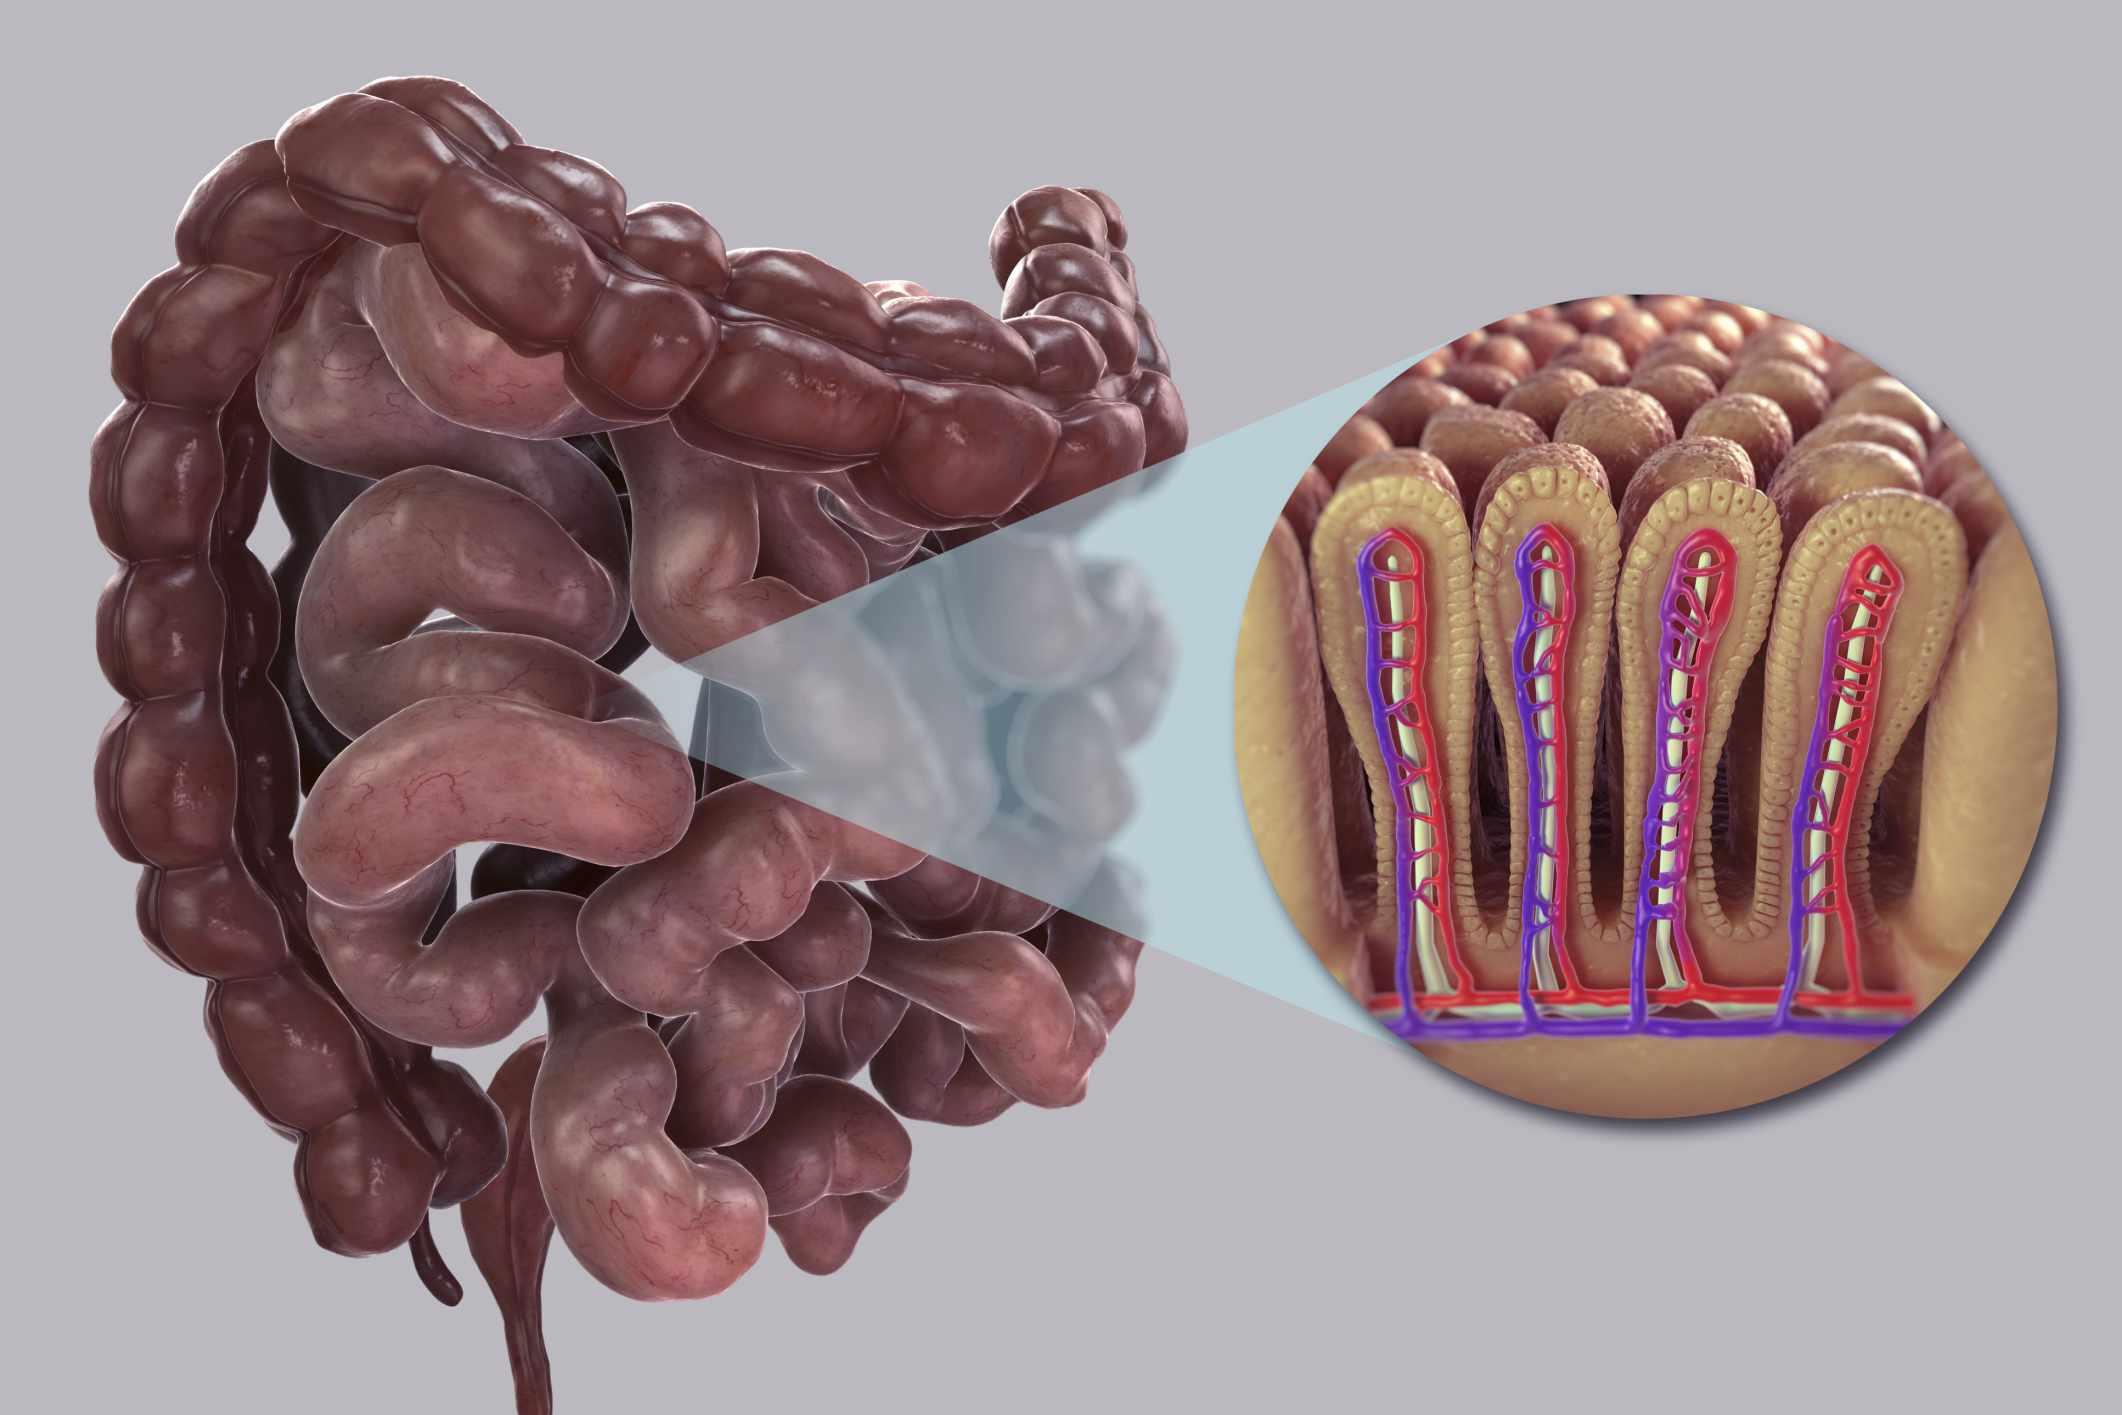 Small Intestine illustration